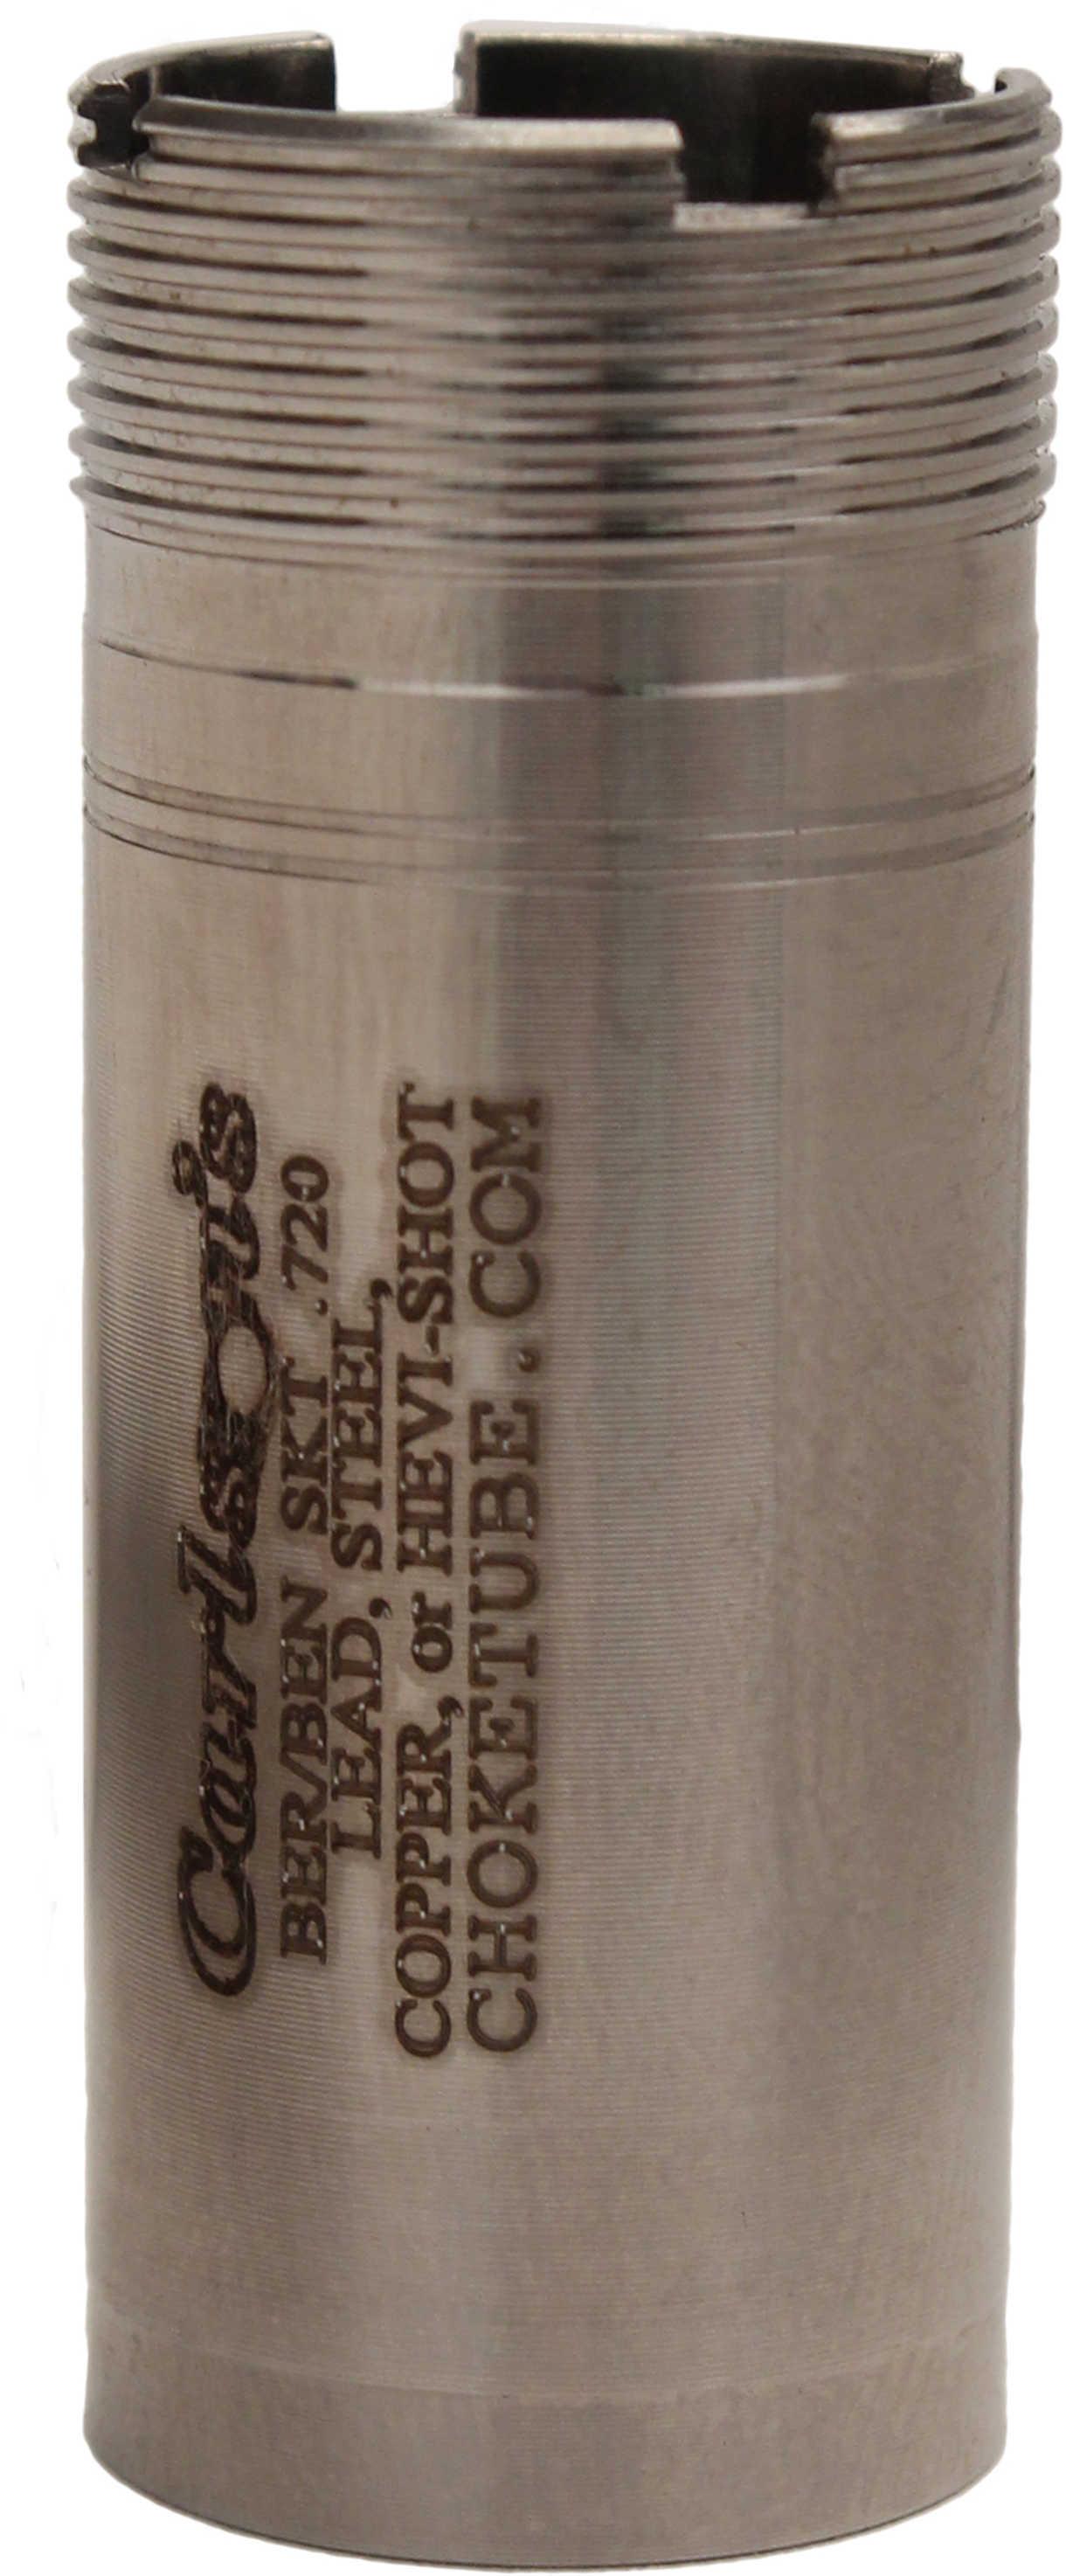 Carlson's Beretta/Benelli Choke Tubes Flush Mount, 12 Gauge, Skeet .720 Md: 16612